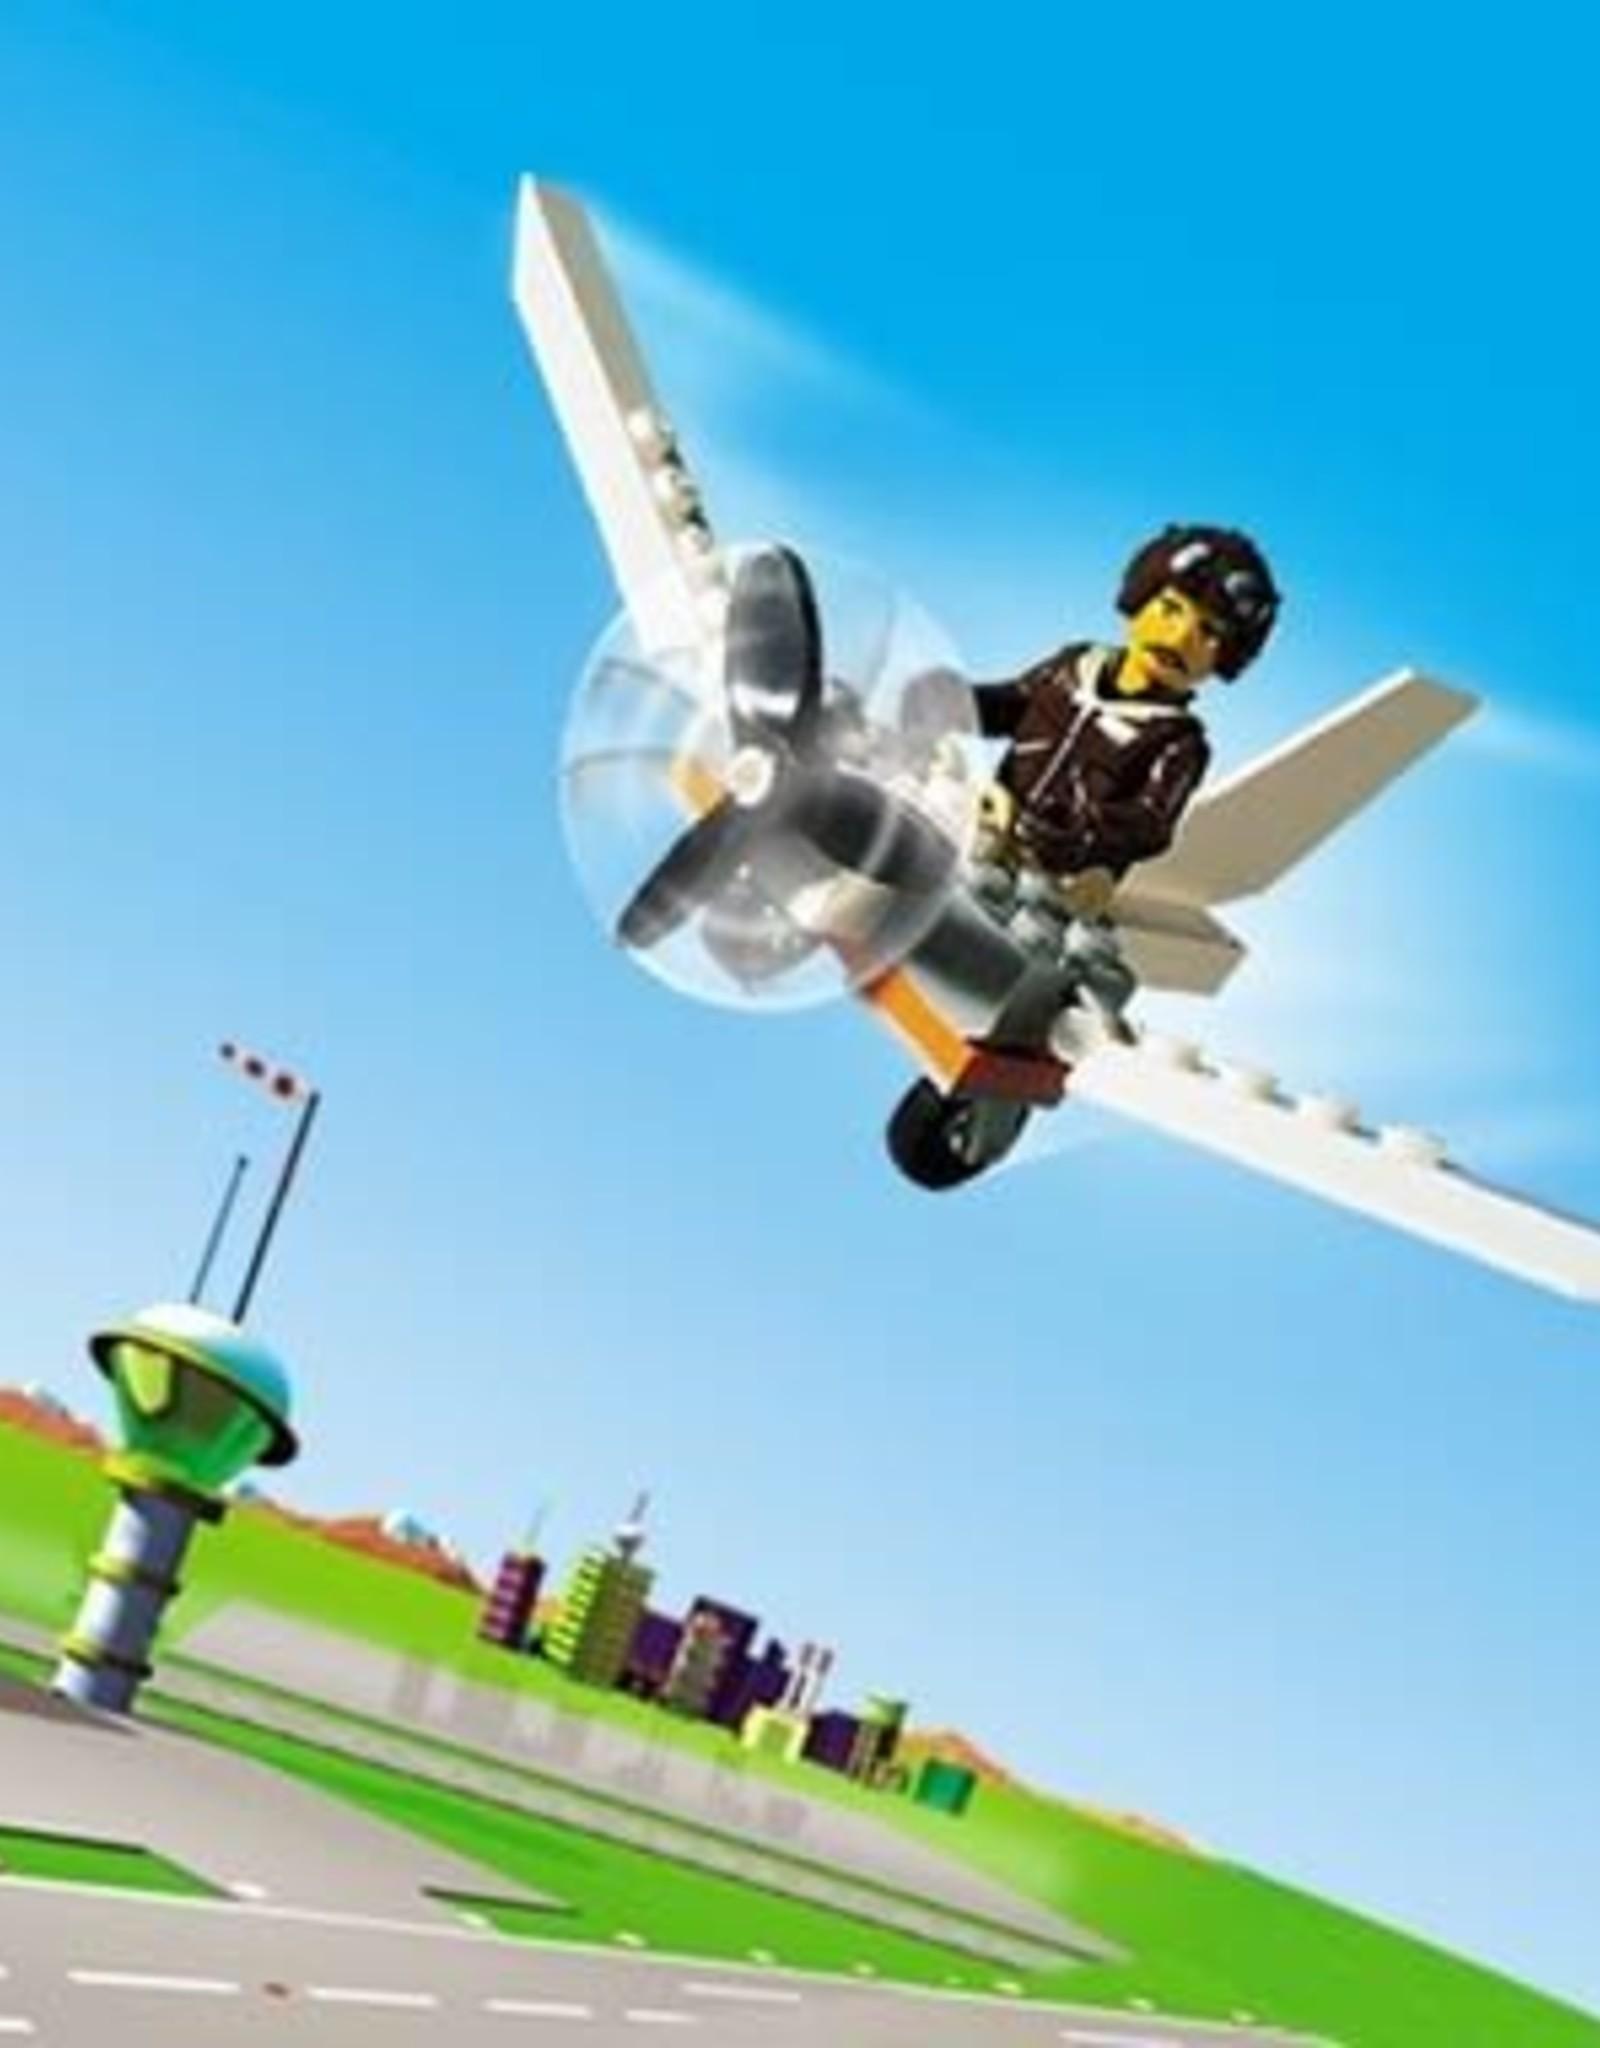 LEGO LEGO 4614 Ultralight Flyer JACK STONE